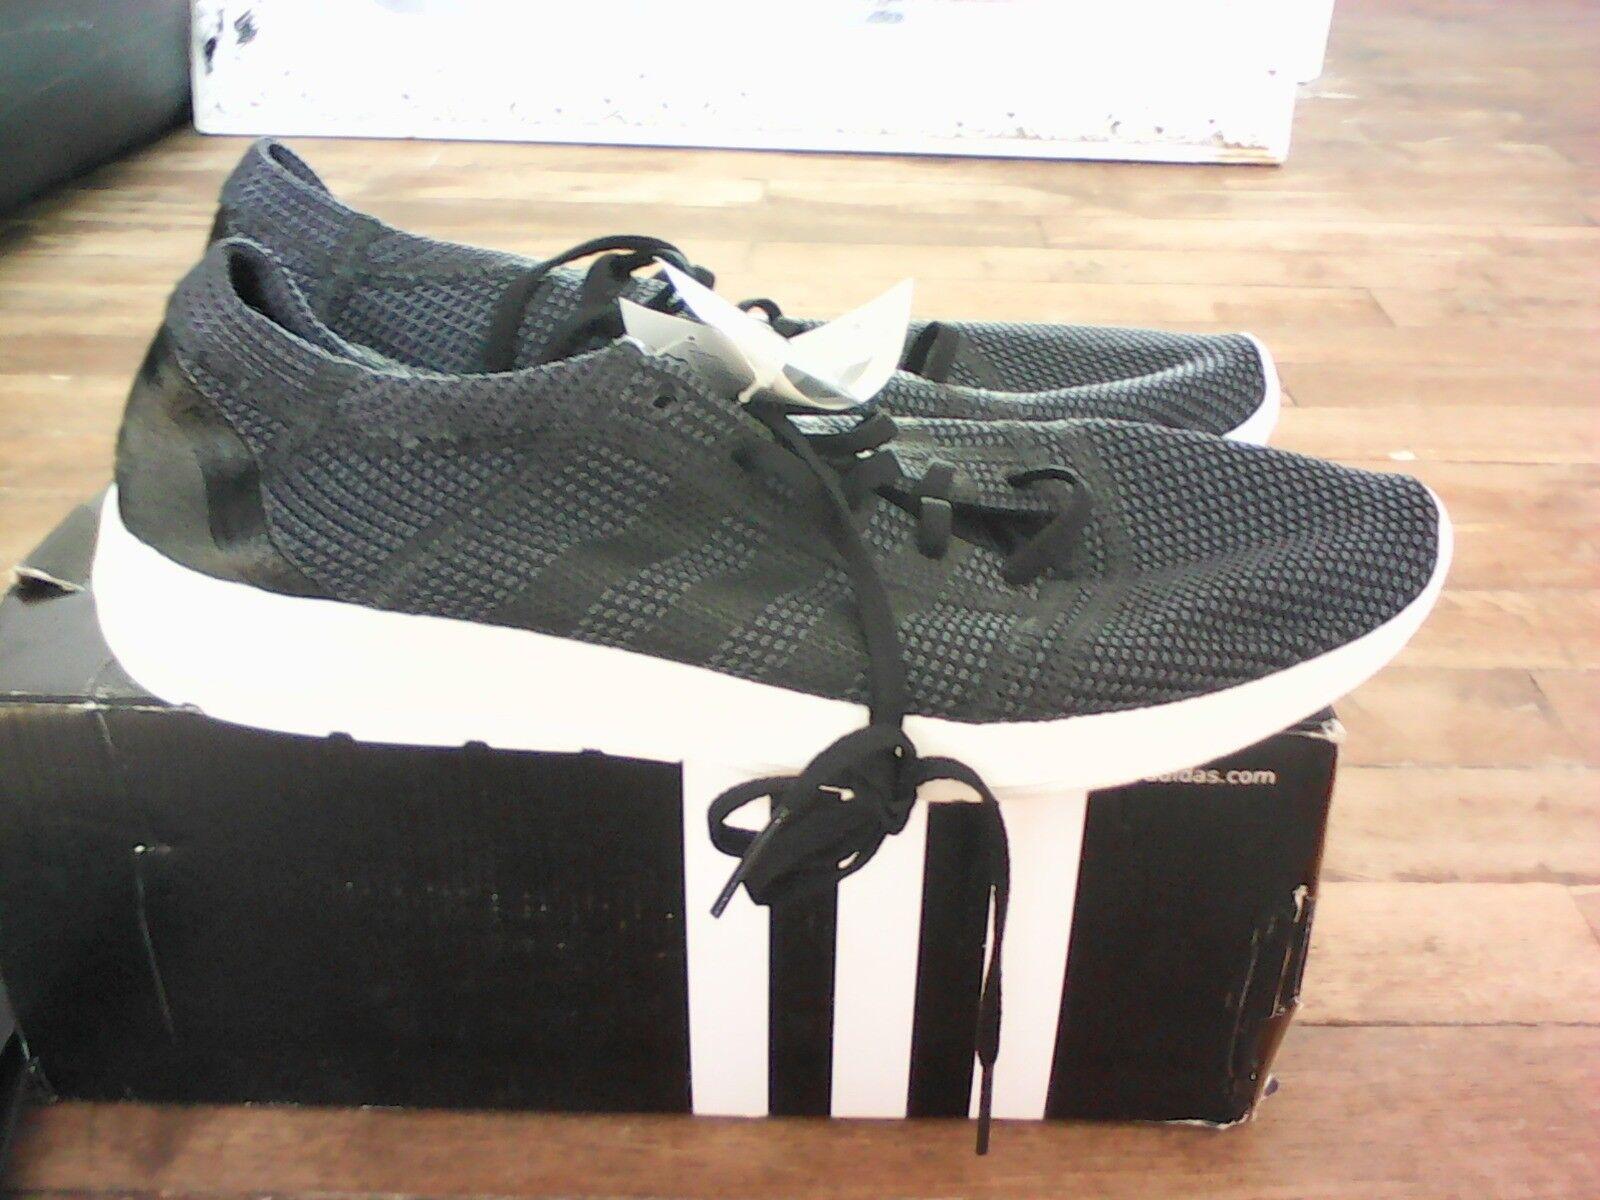 NEW Hommes Adidas CAMO Originals Adi-Ease Trainers Baskets CAMO Adidas Ltd Edition Retro SB 0f44dc